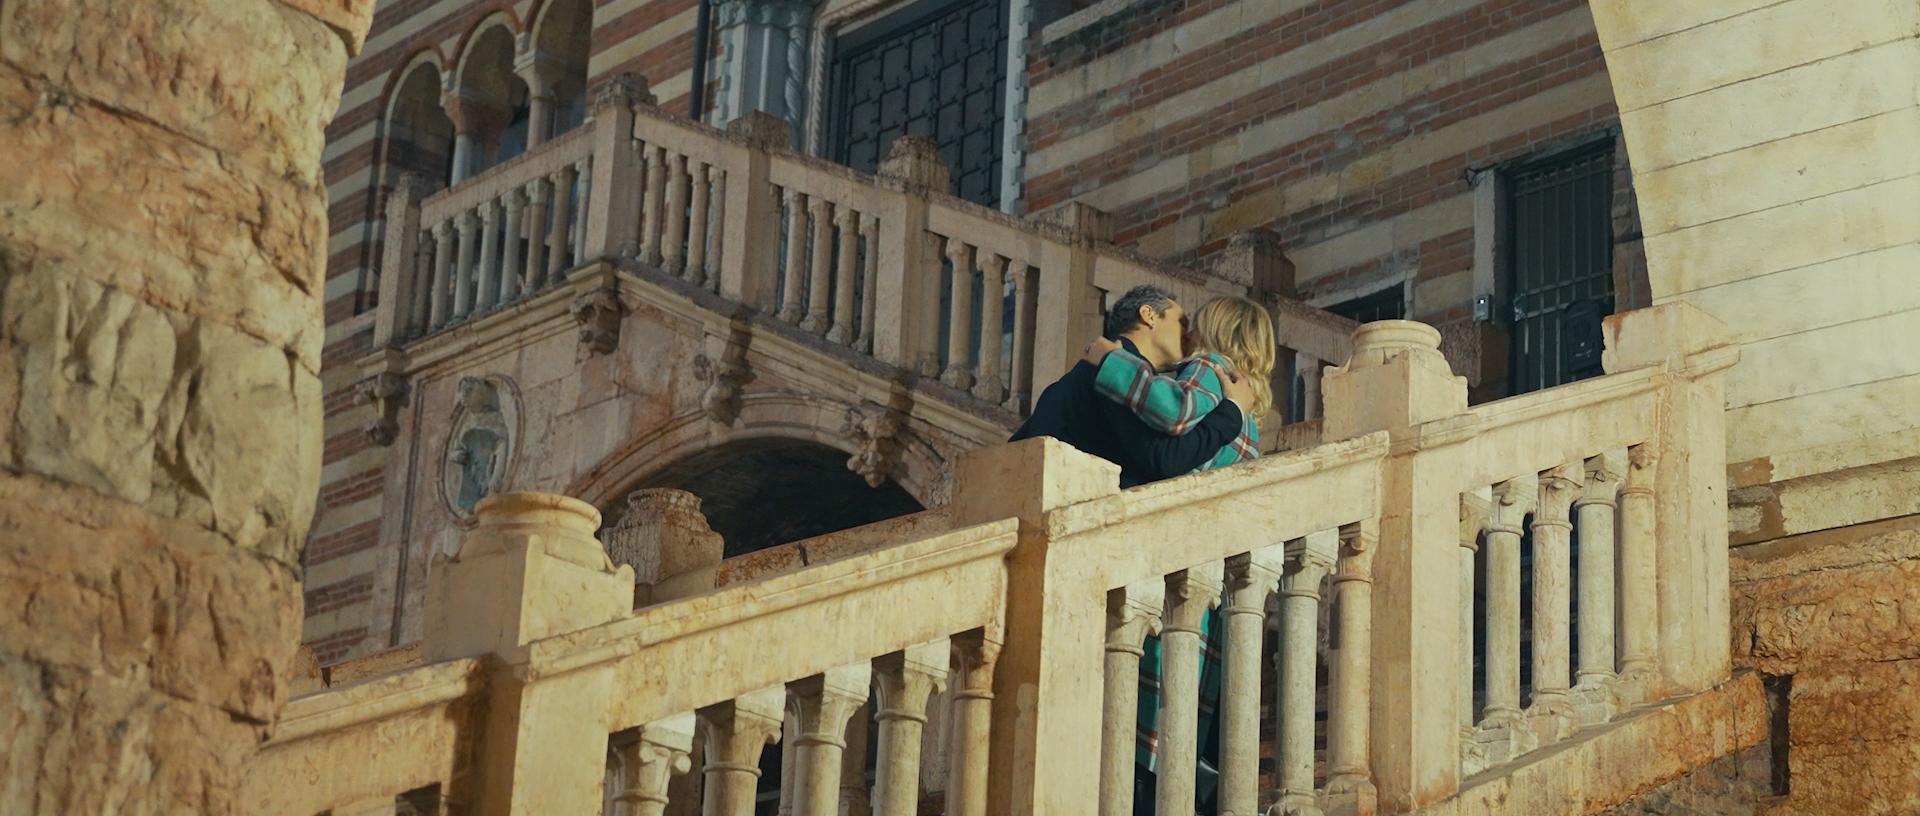 Francesca Barra e Claudio Santamaria nel video di Dante a Verona